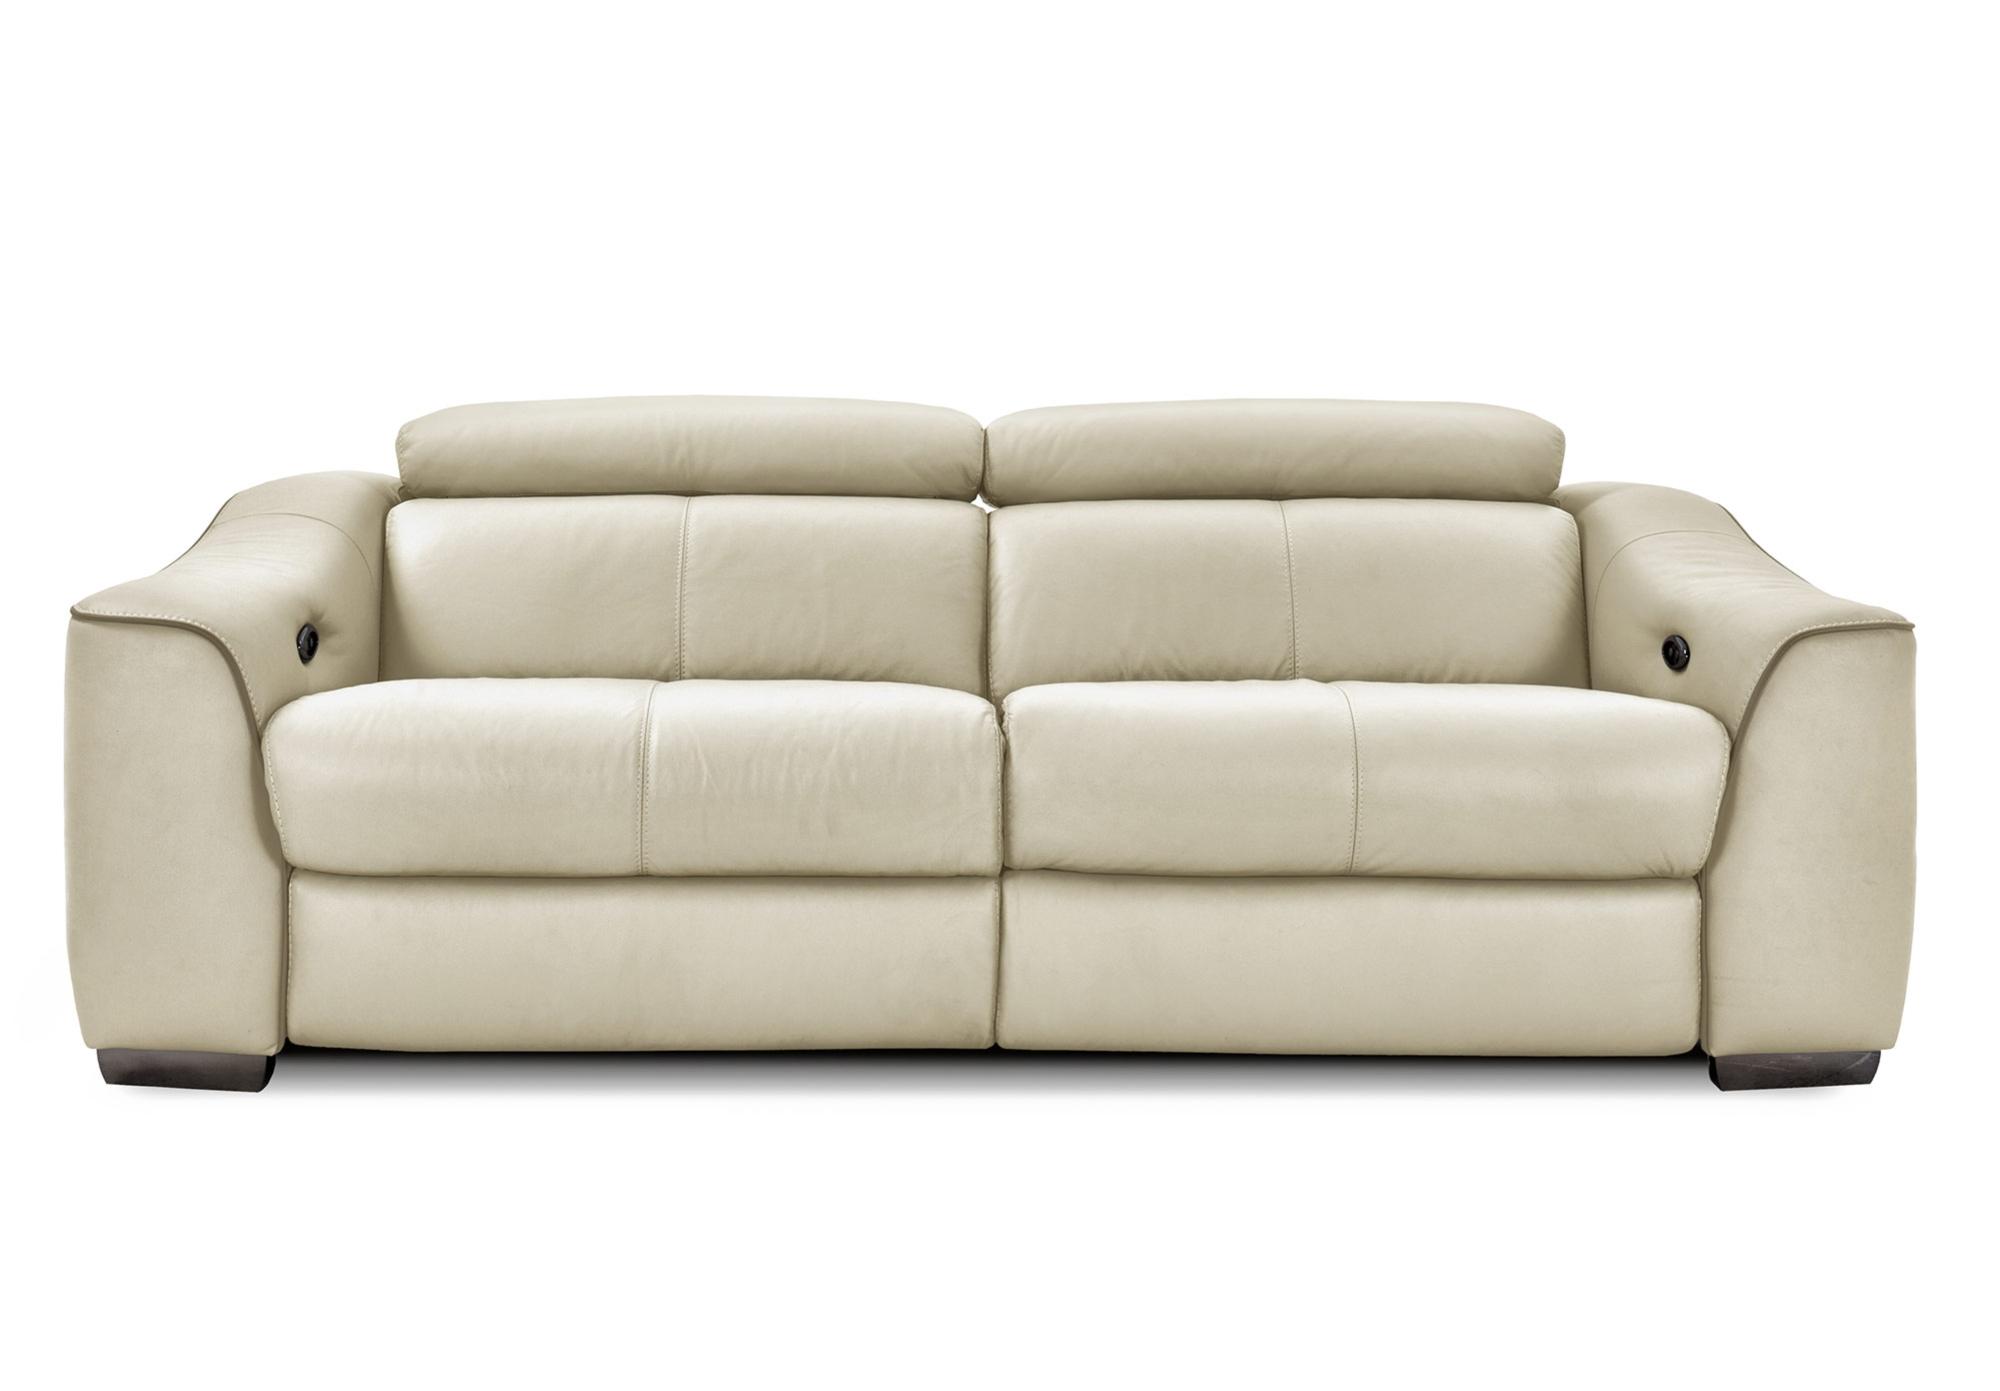 Htl Leather Sofas Home Decor 88